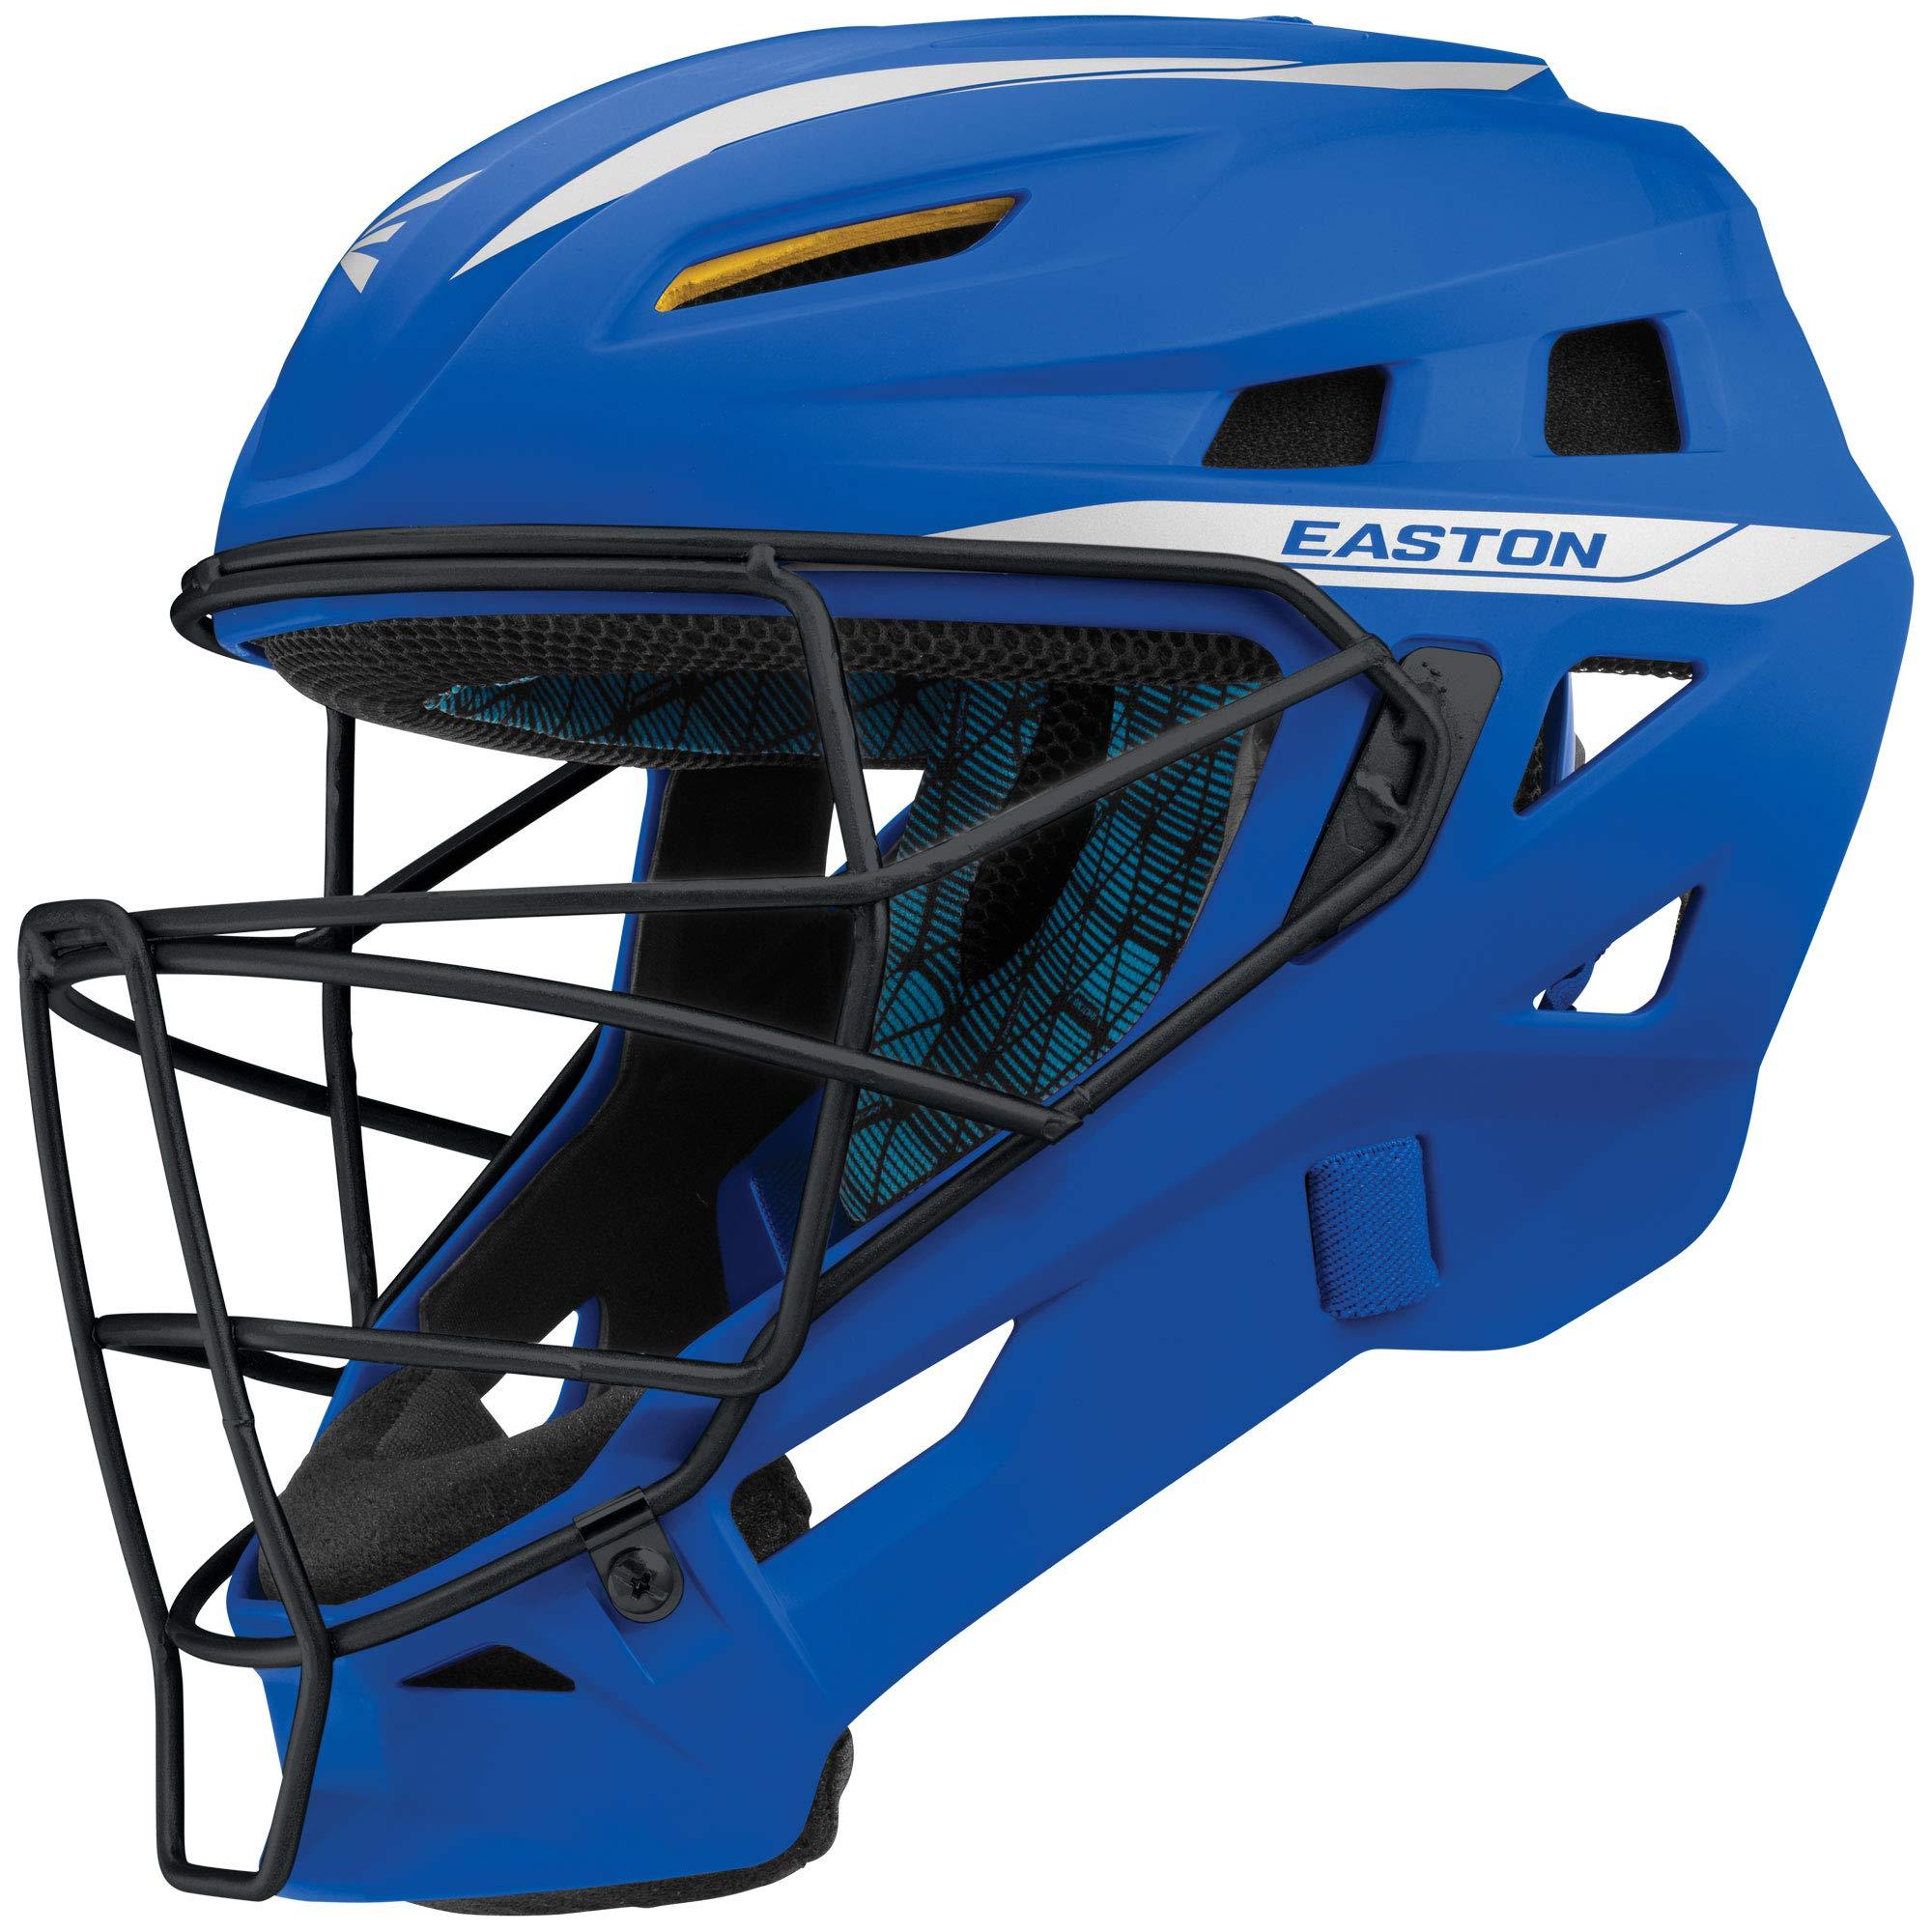 Easton Pro x Catchers Helmet Pro-X C-Helmet RY/Sl S, Red/ Silver, Small by Easton